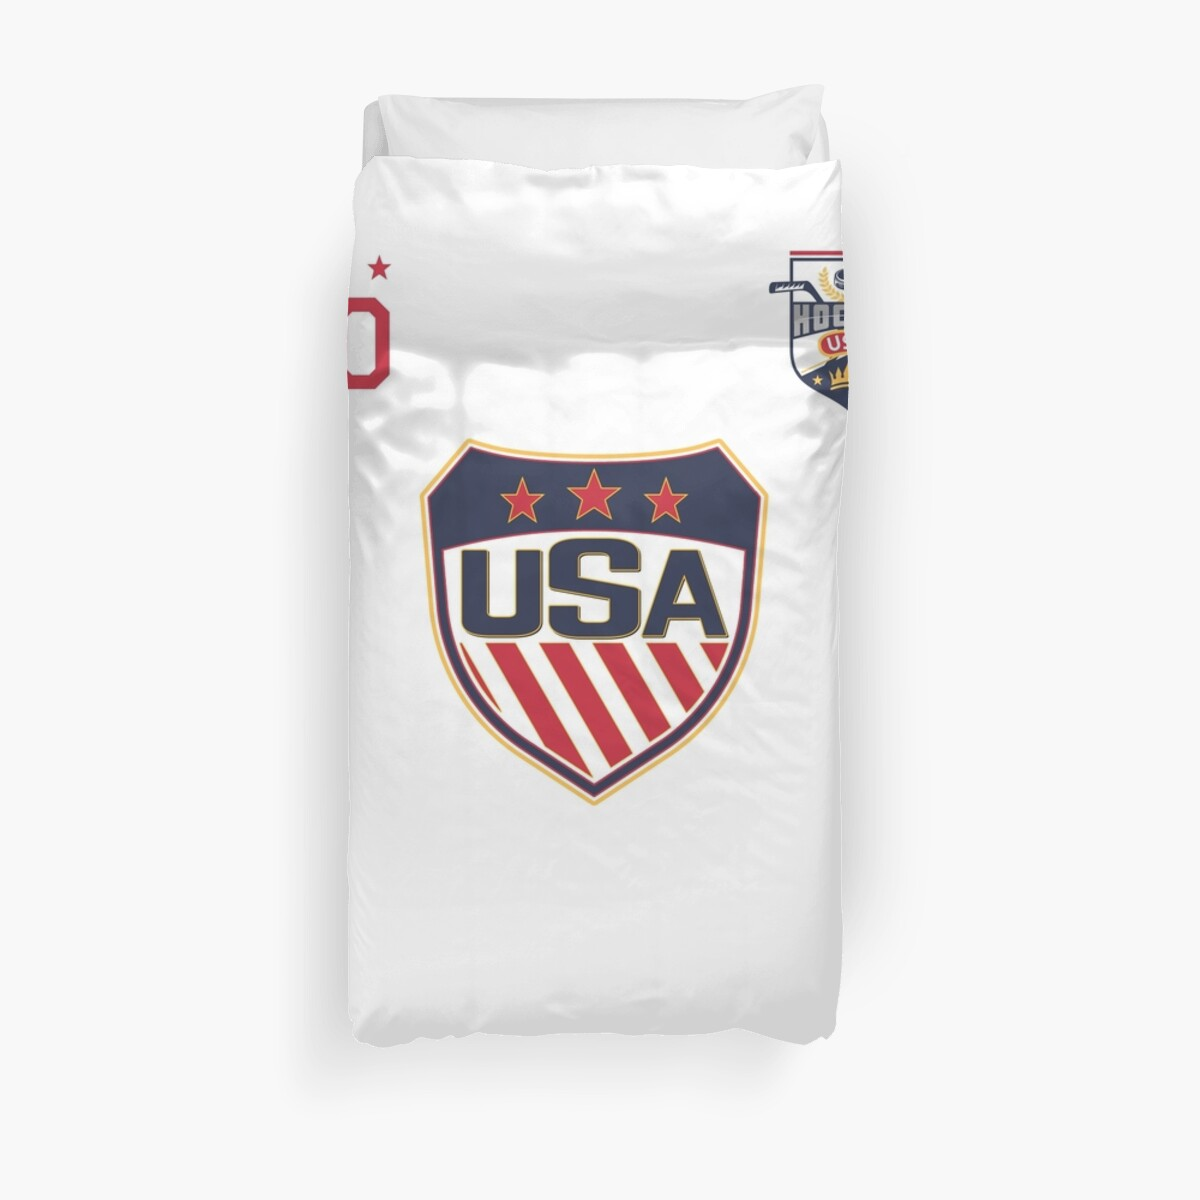 979d9184b USA National Ice Hockey Jersey Uniform number 10